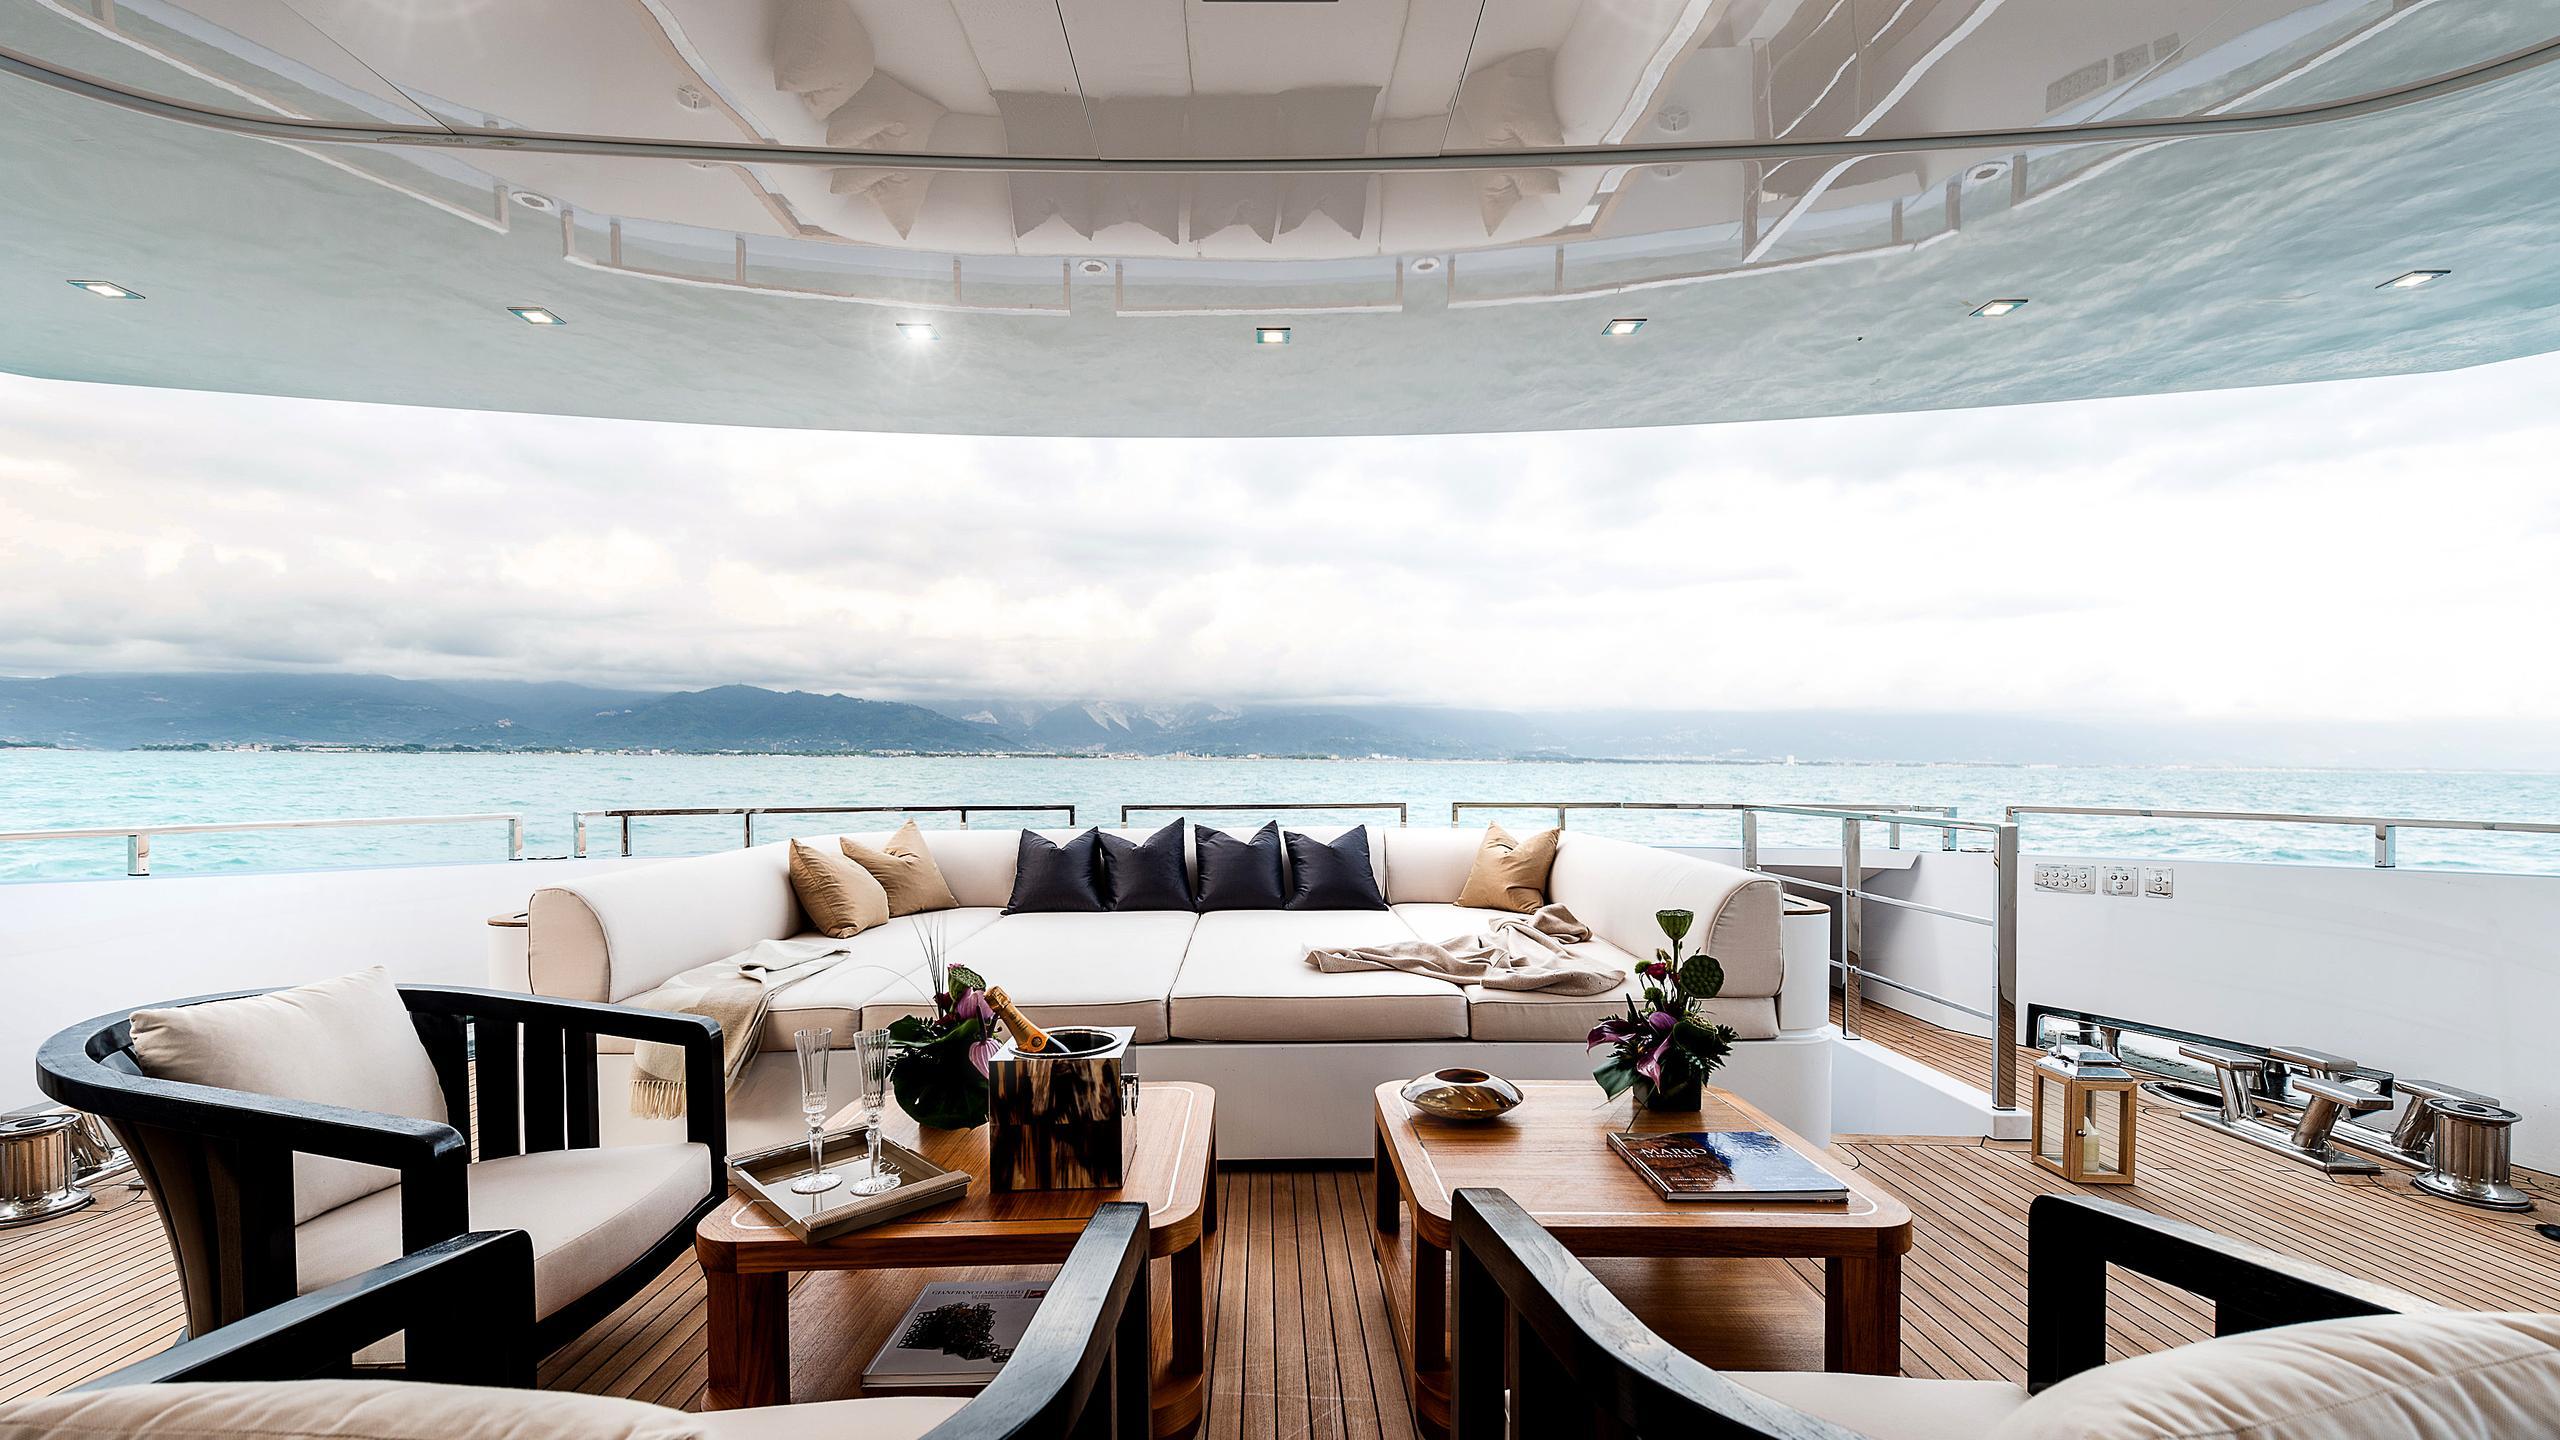 flying-dragon-yachtEdit